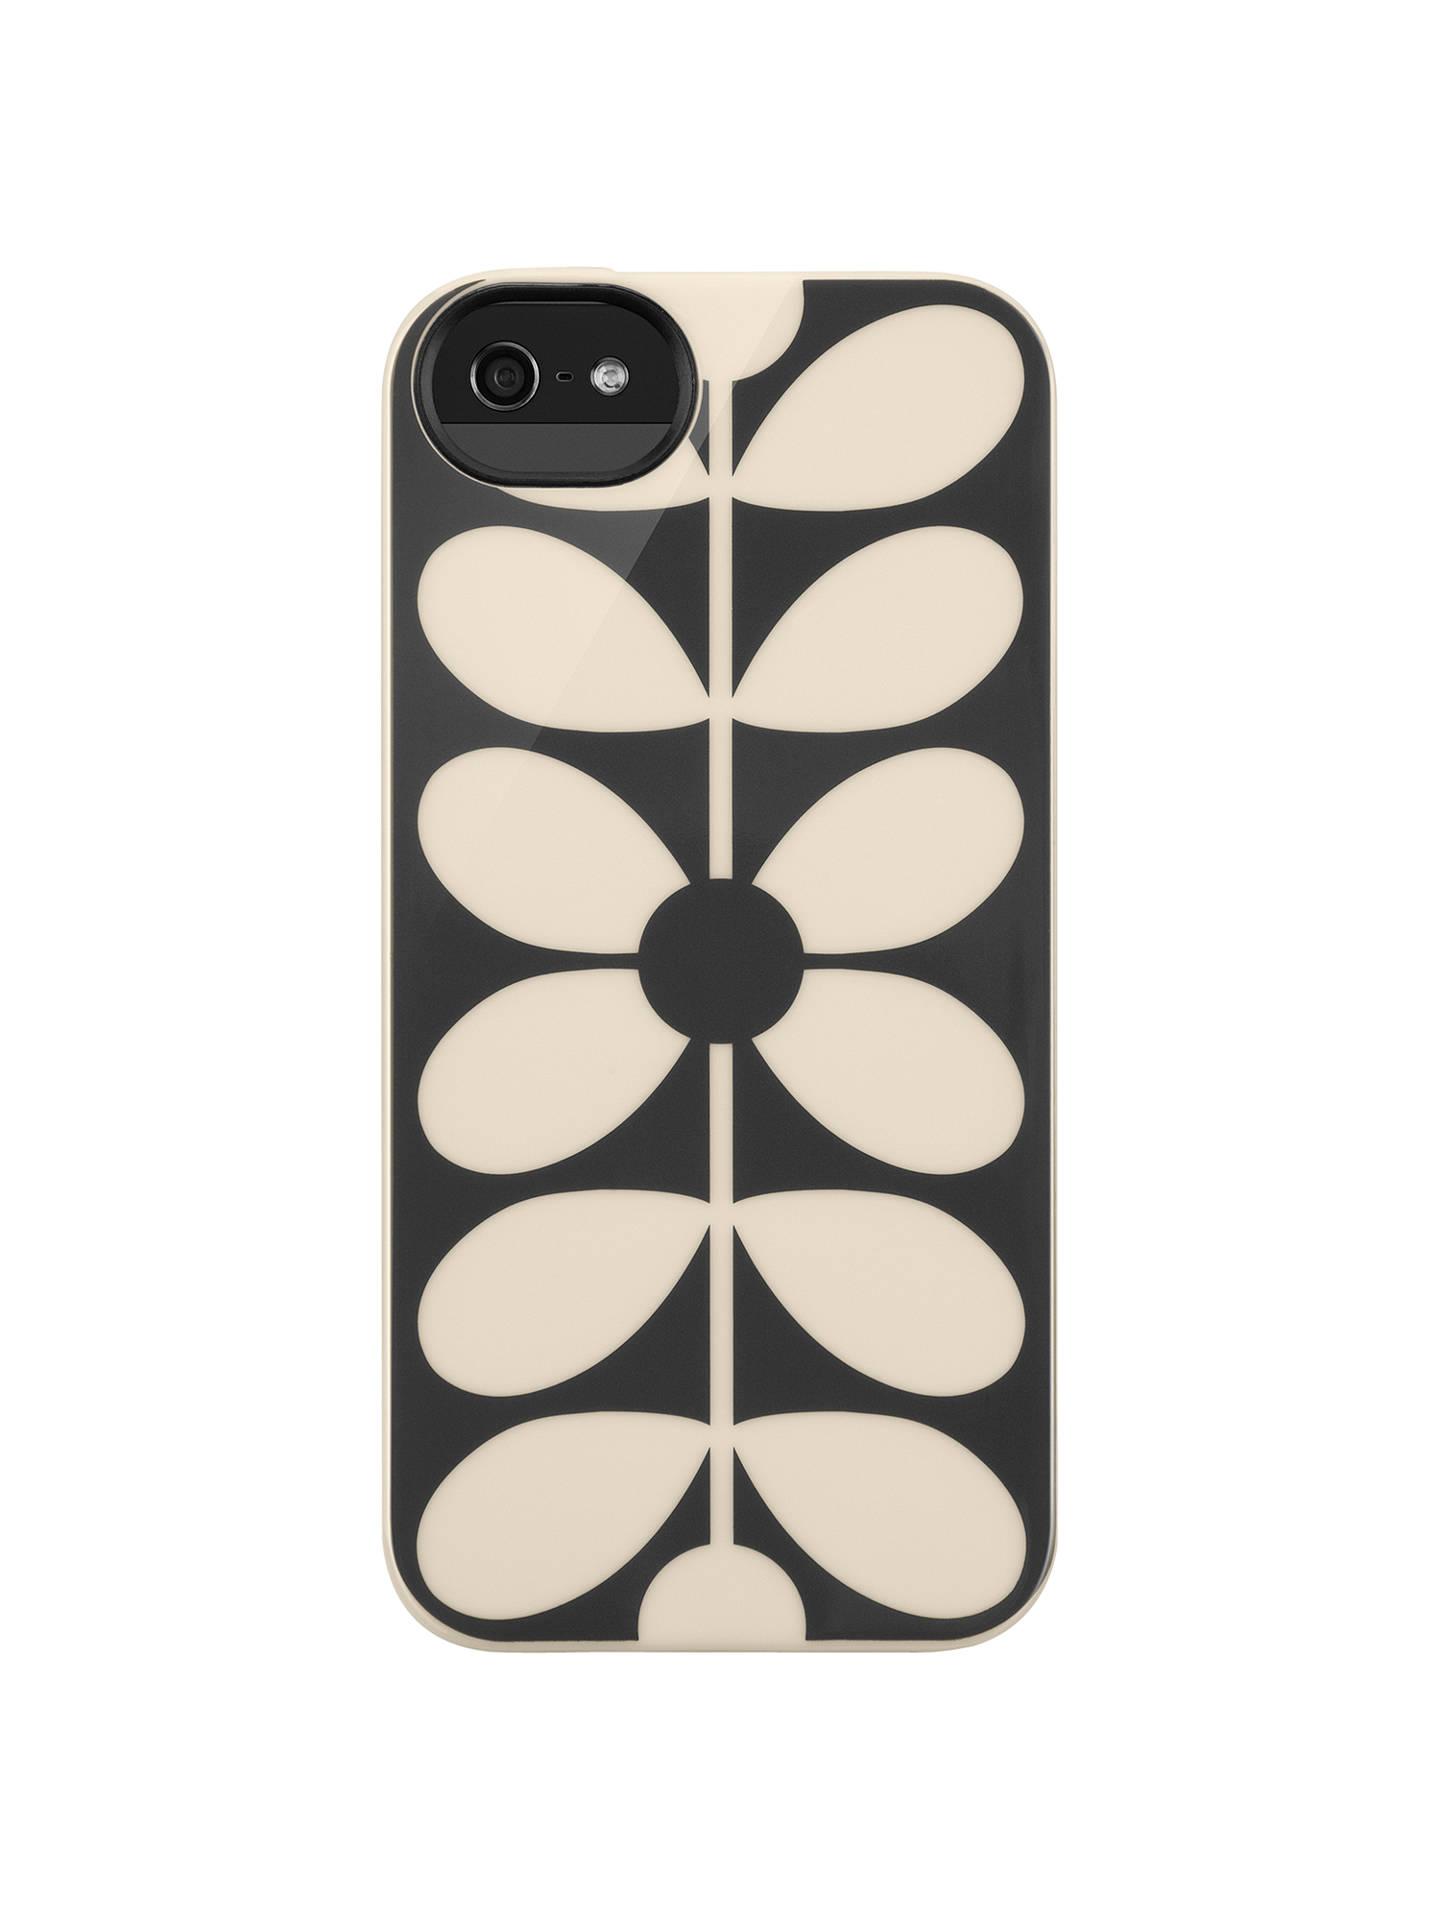 superior quality 6331b 8c46d Orla Kiely Optic Stem Case for iPhone SE/5s/5 at John Lewis & Partners